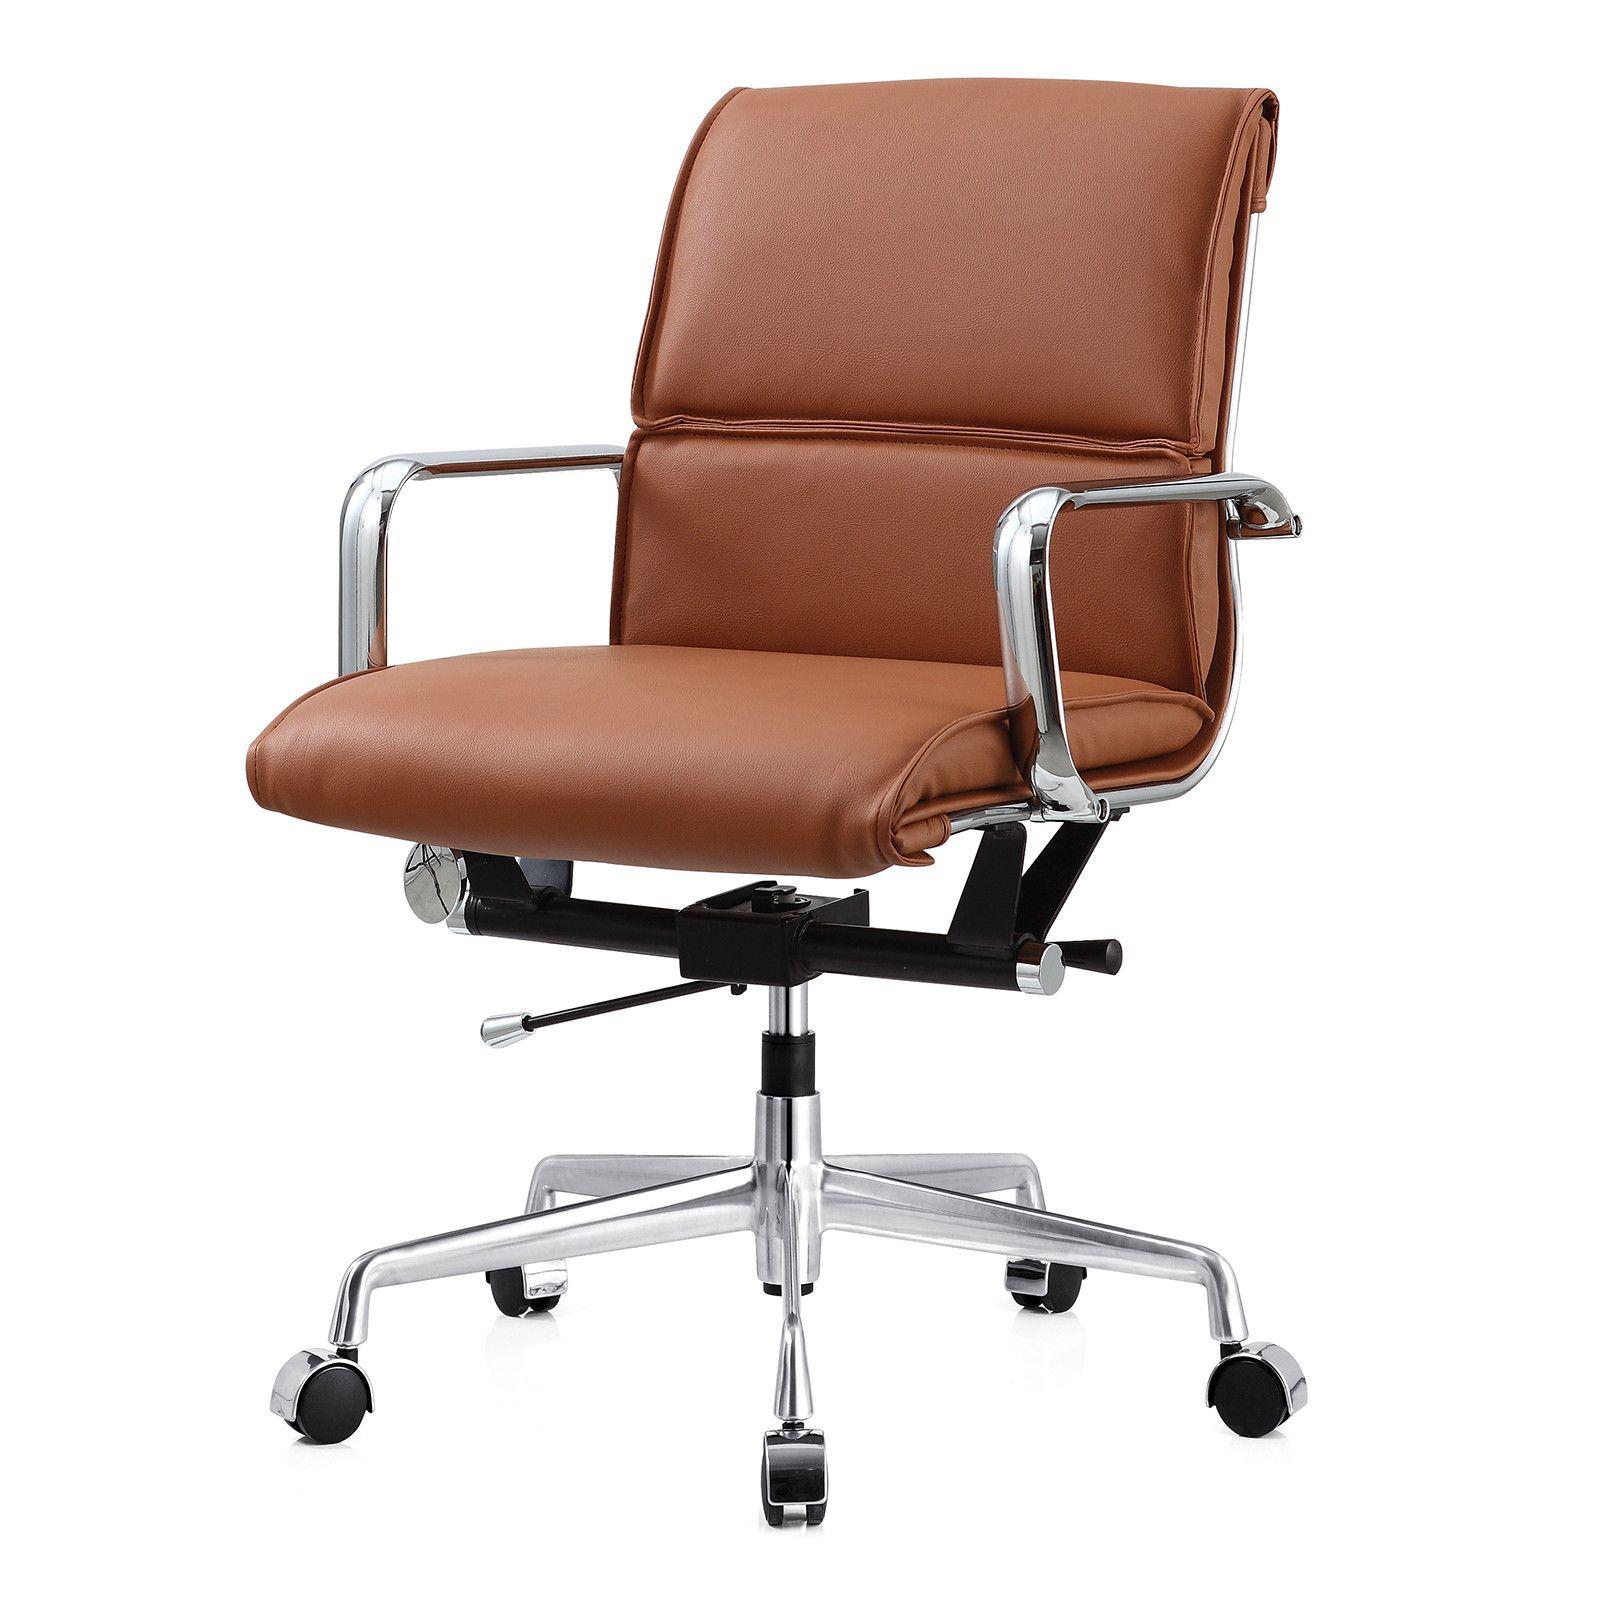 184 of Wayfair Leather office chair, Modern office